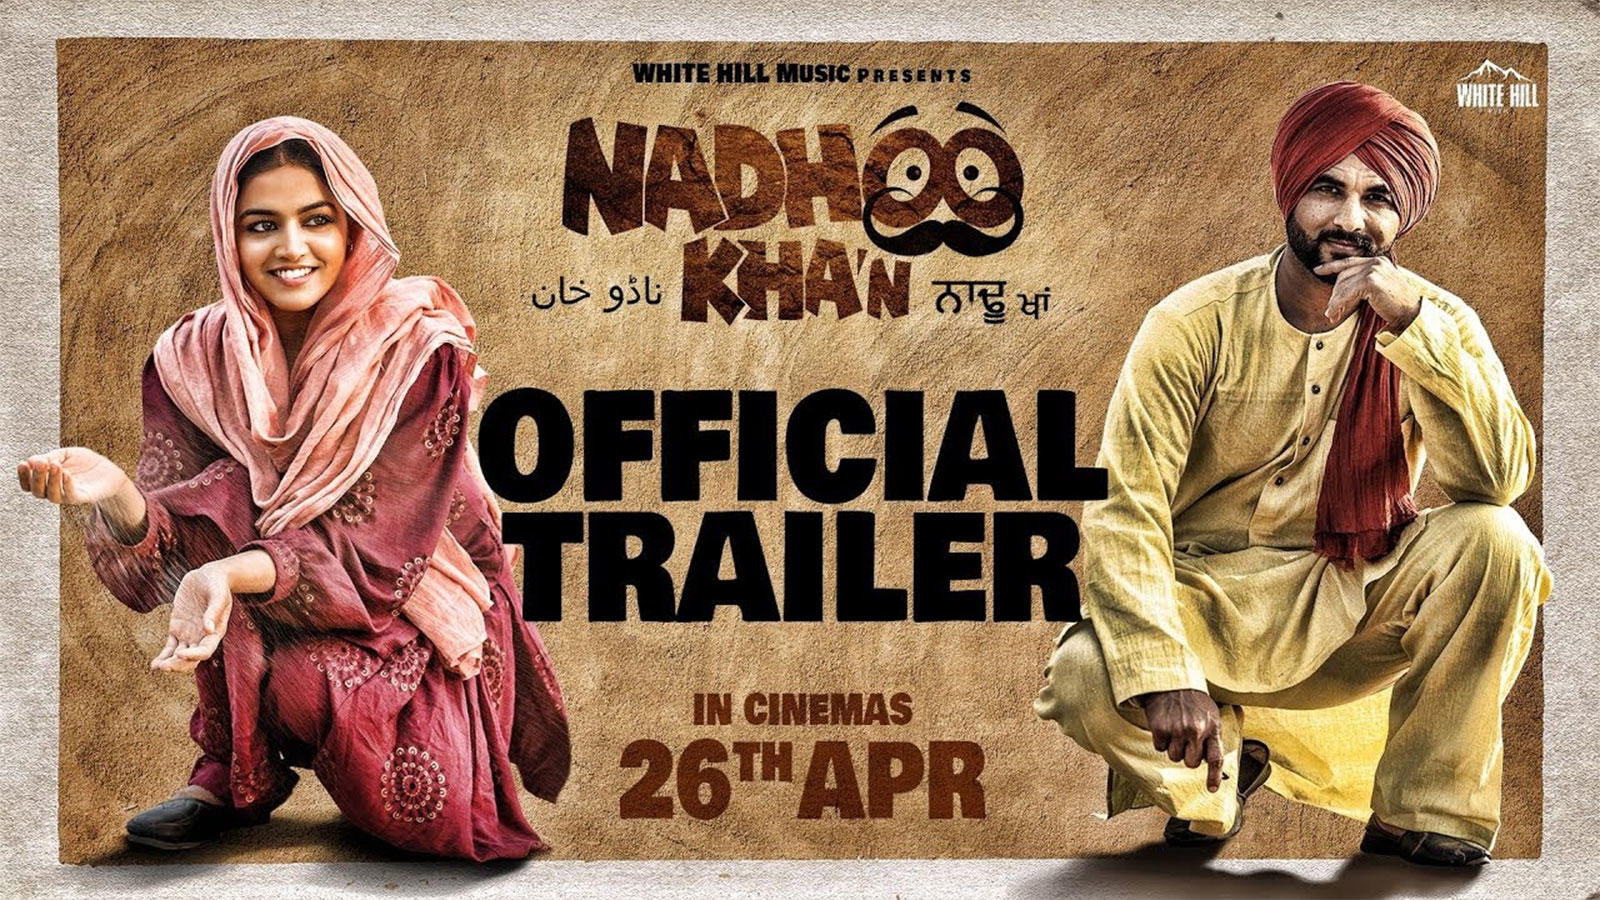 Nadhoo Khan - Official Trailer